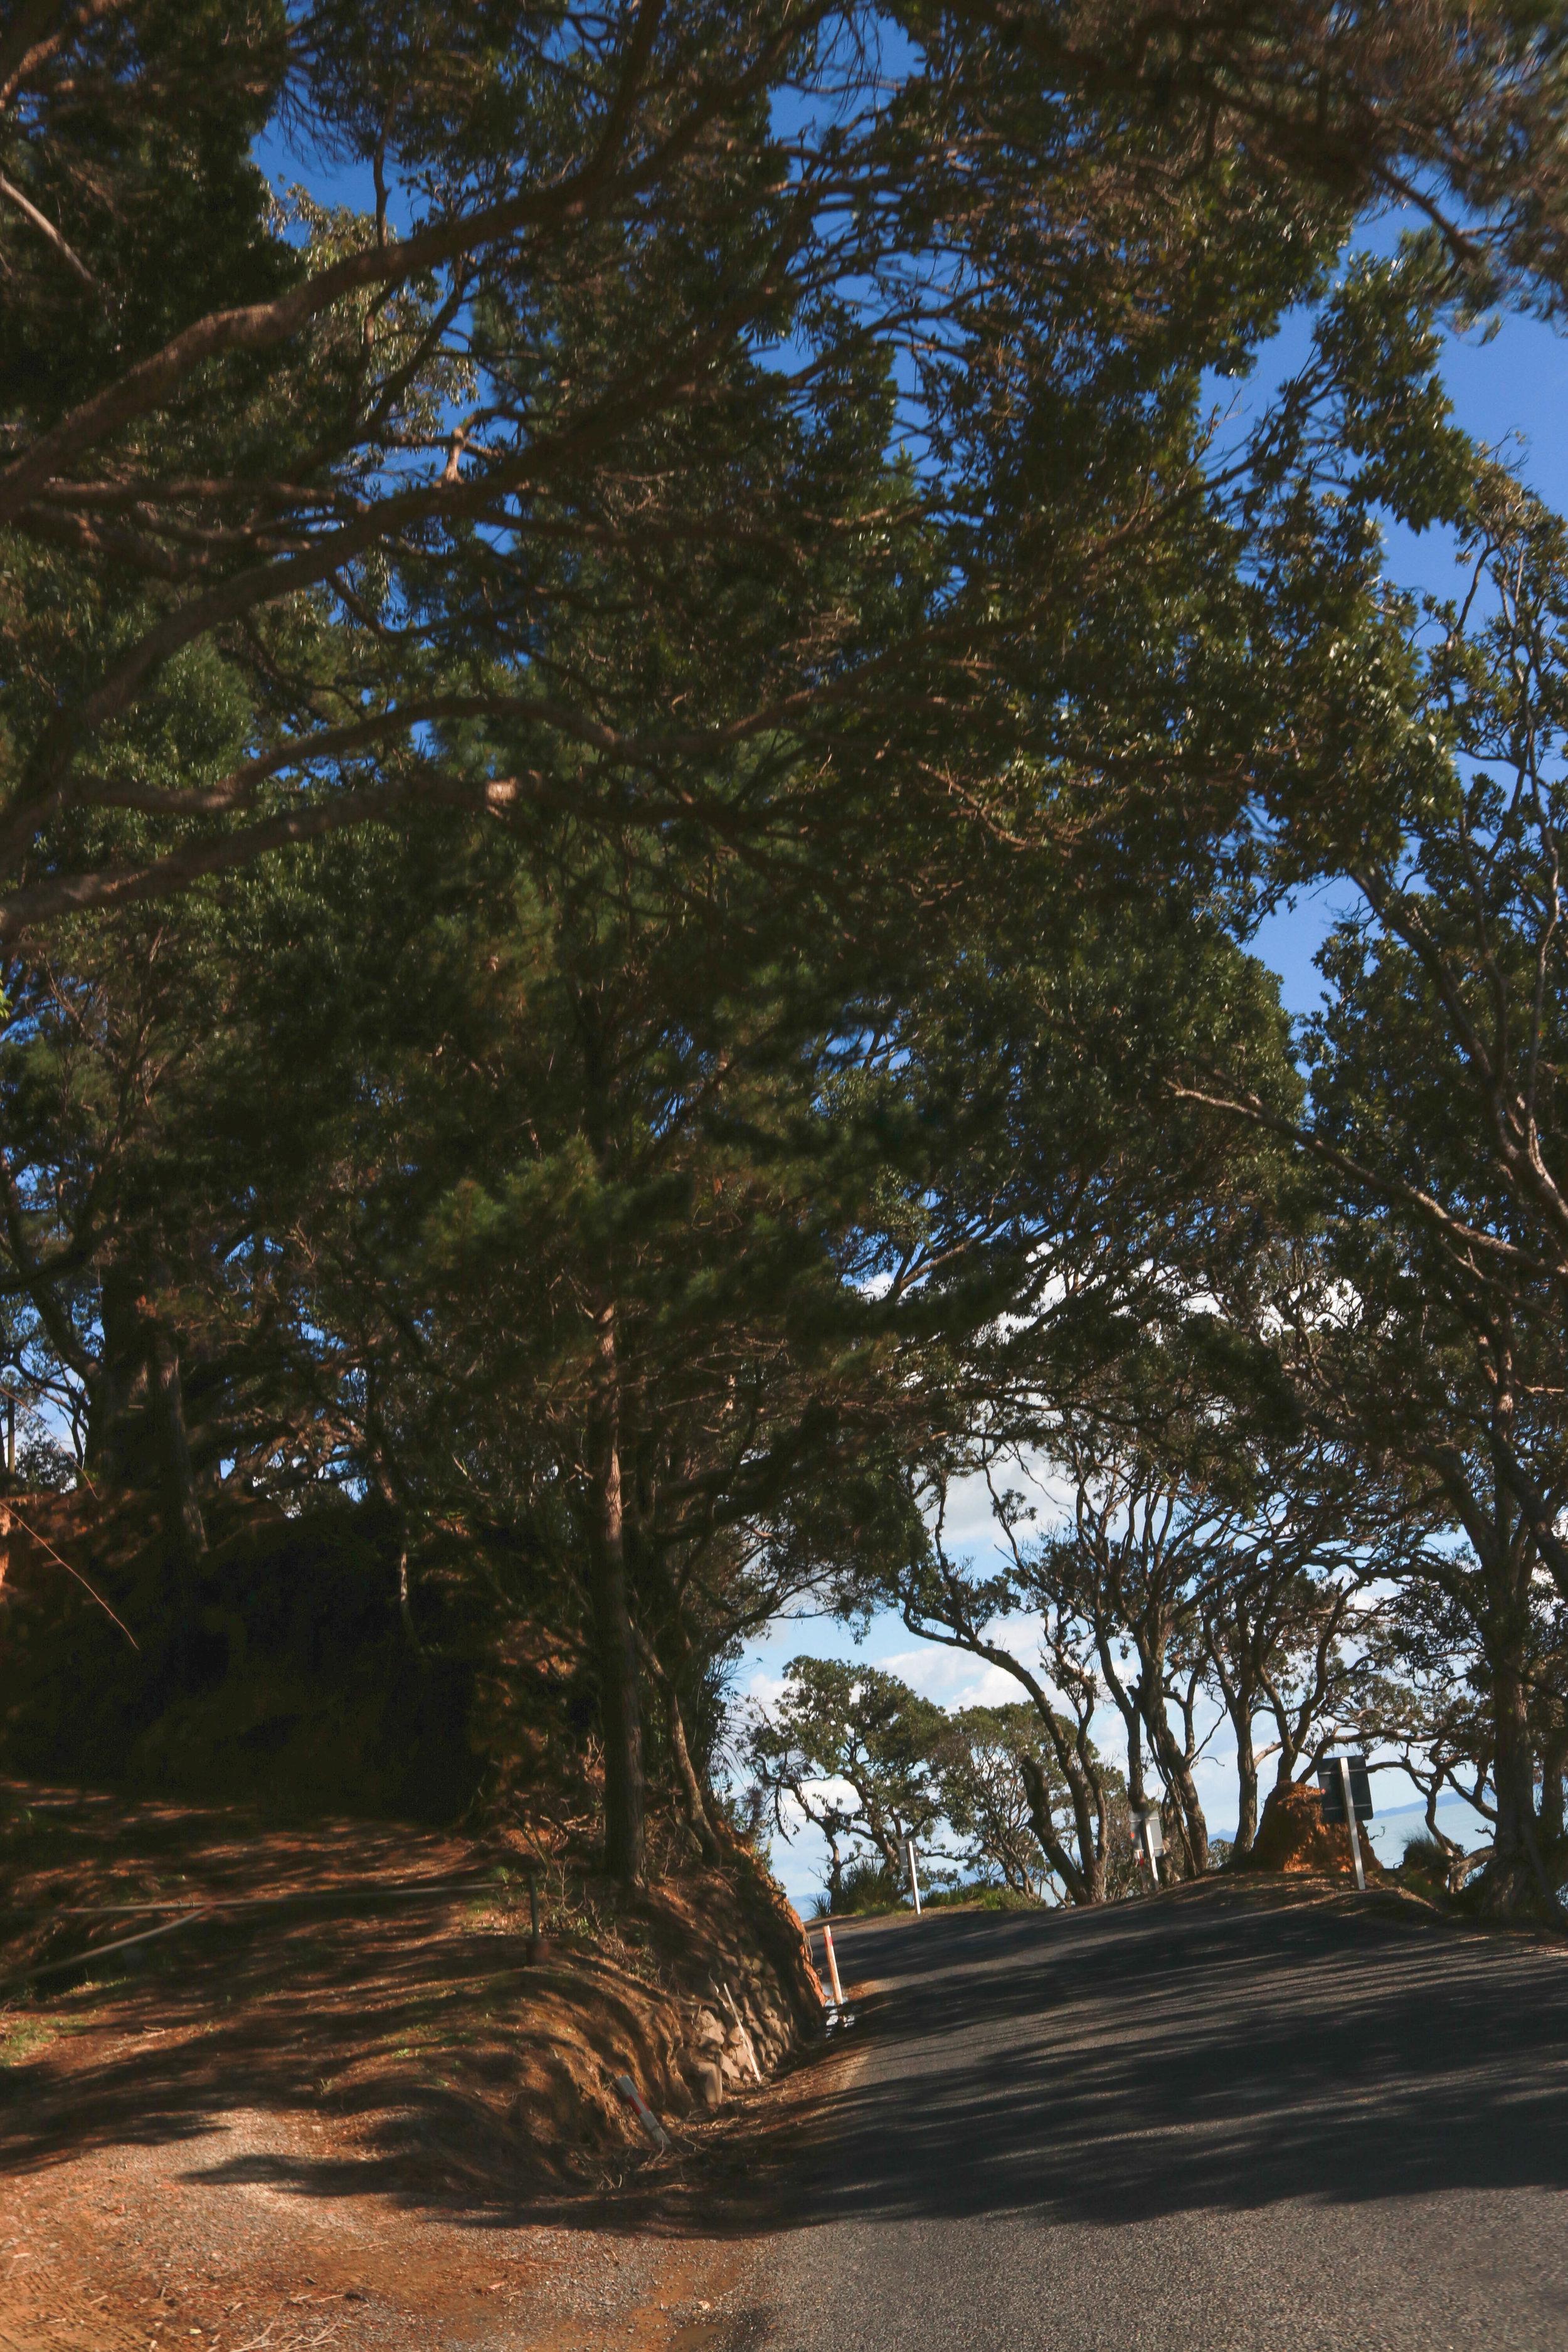 Pohutukawa trees along the Pacific Coast Highway